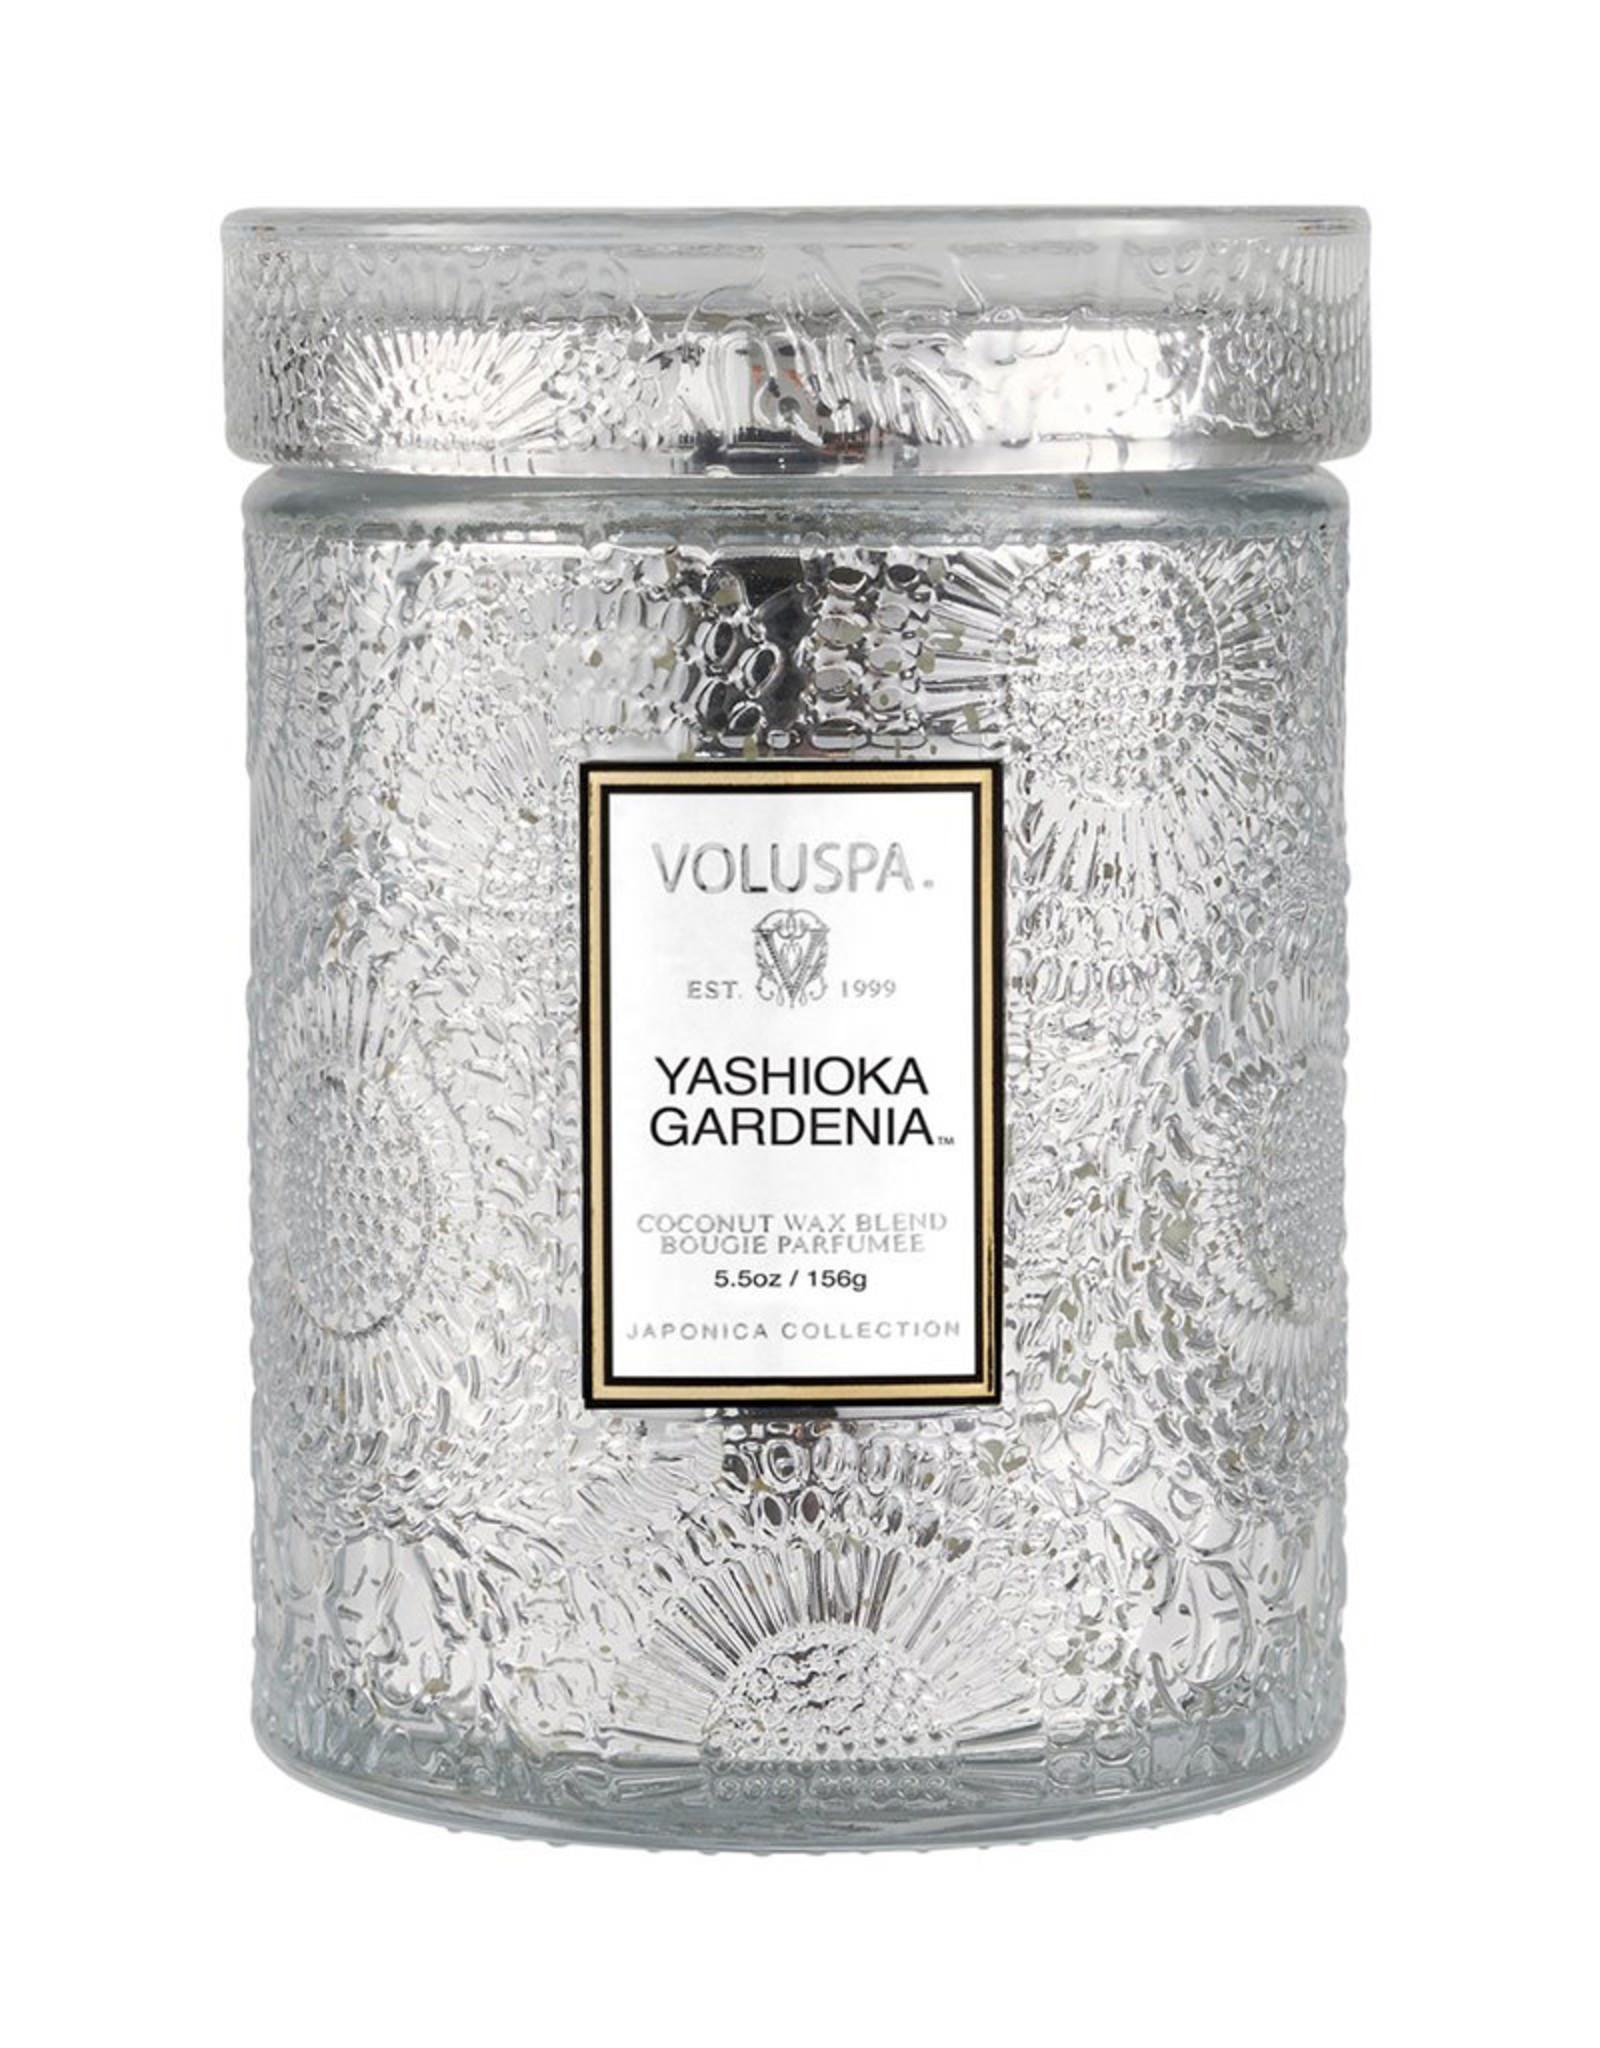 VOLUSPA YASHIOKA GARDENIA SMALL JAR CANDLE